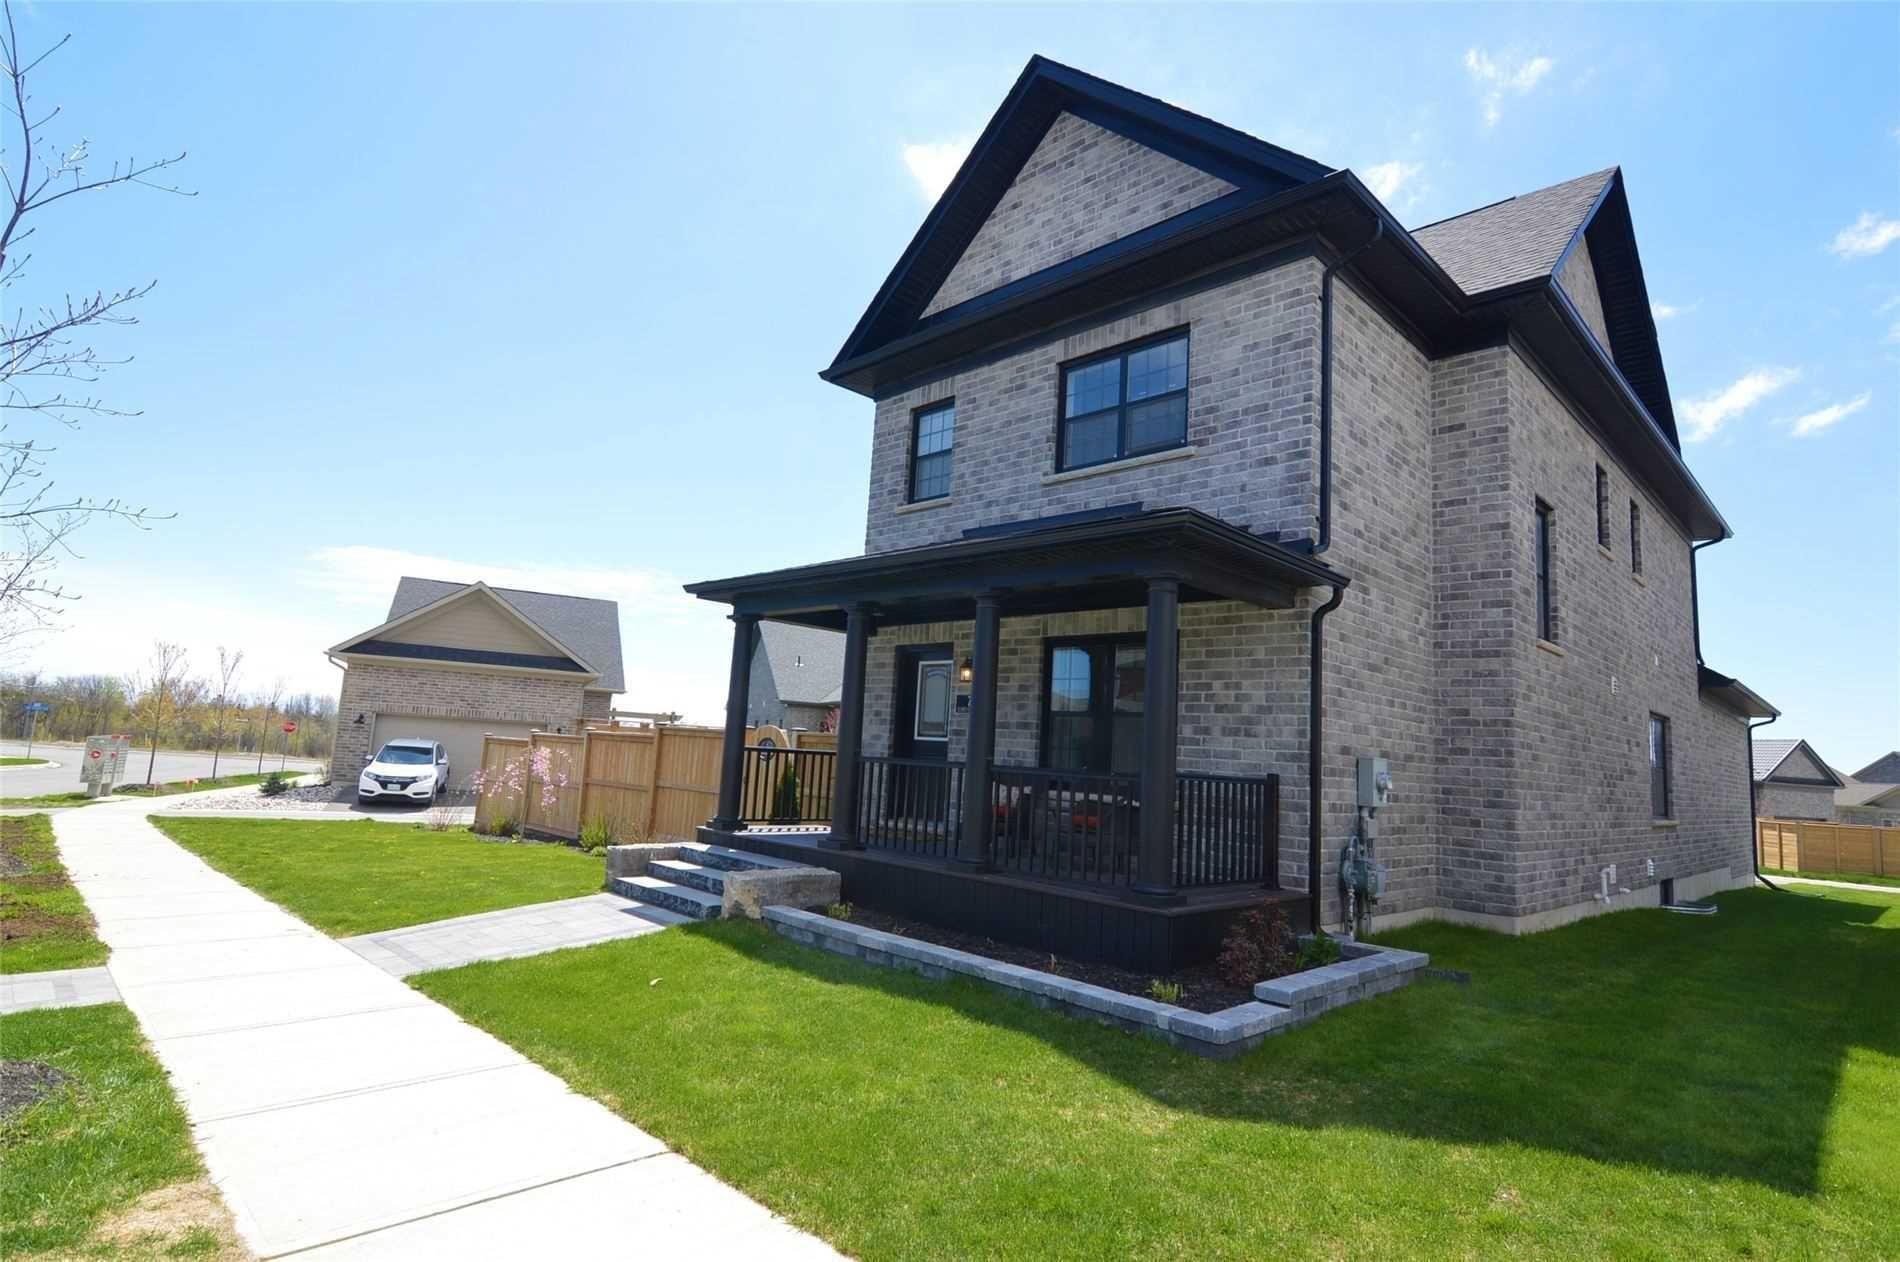 Main Photo: 709 Elmer Hutton Street: Cobourg House (2-Storey) for sale : MLS®# X5259248